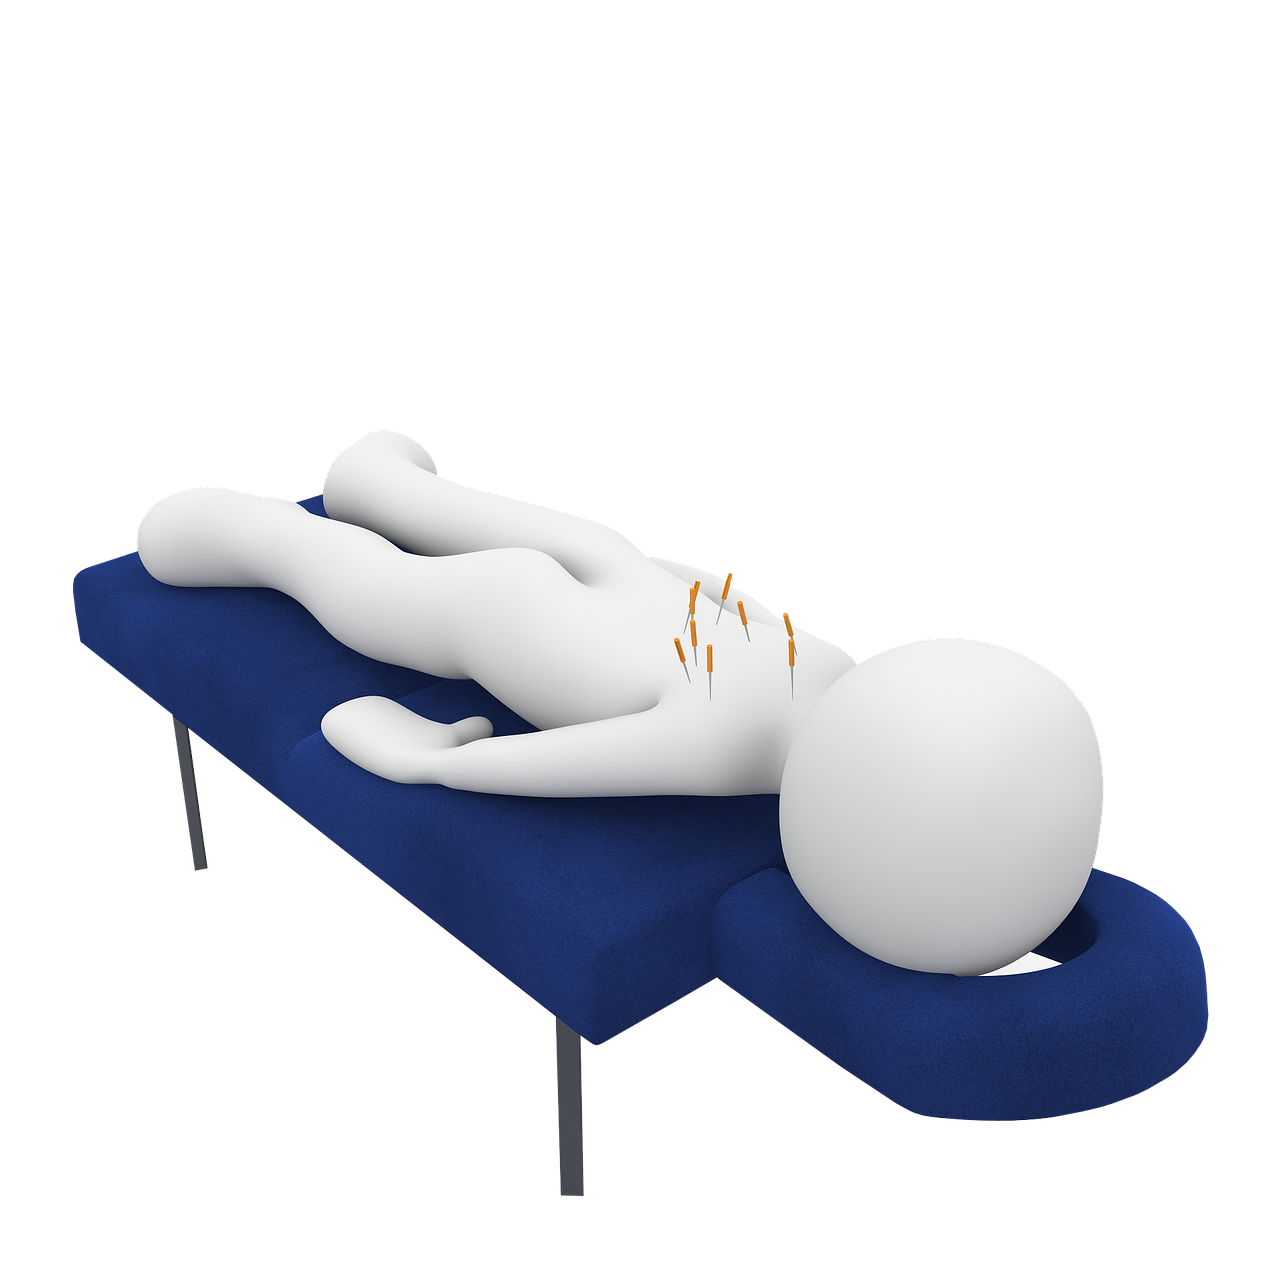 Fysio Arnoud le Grand Fysiotherapeuten Bunnik en Fysio Fitness fysiotherapie spieren